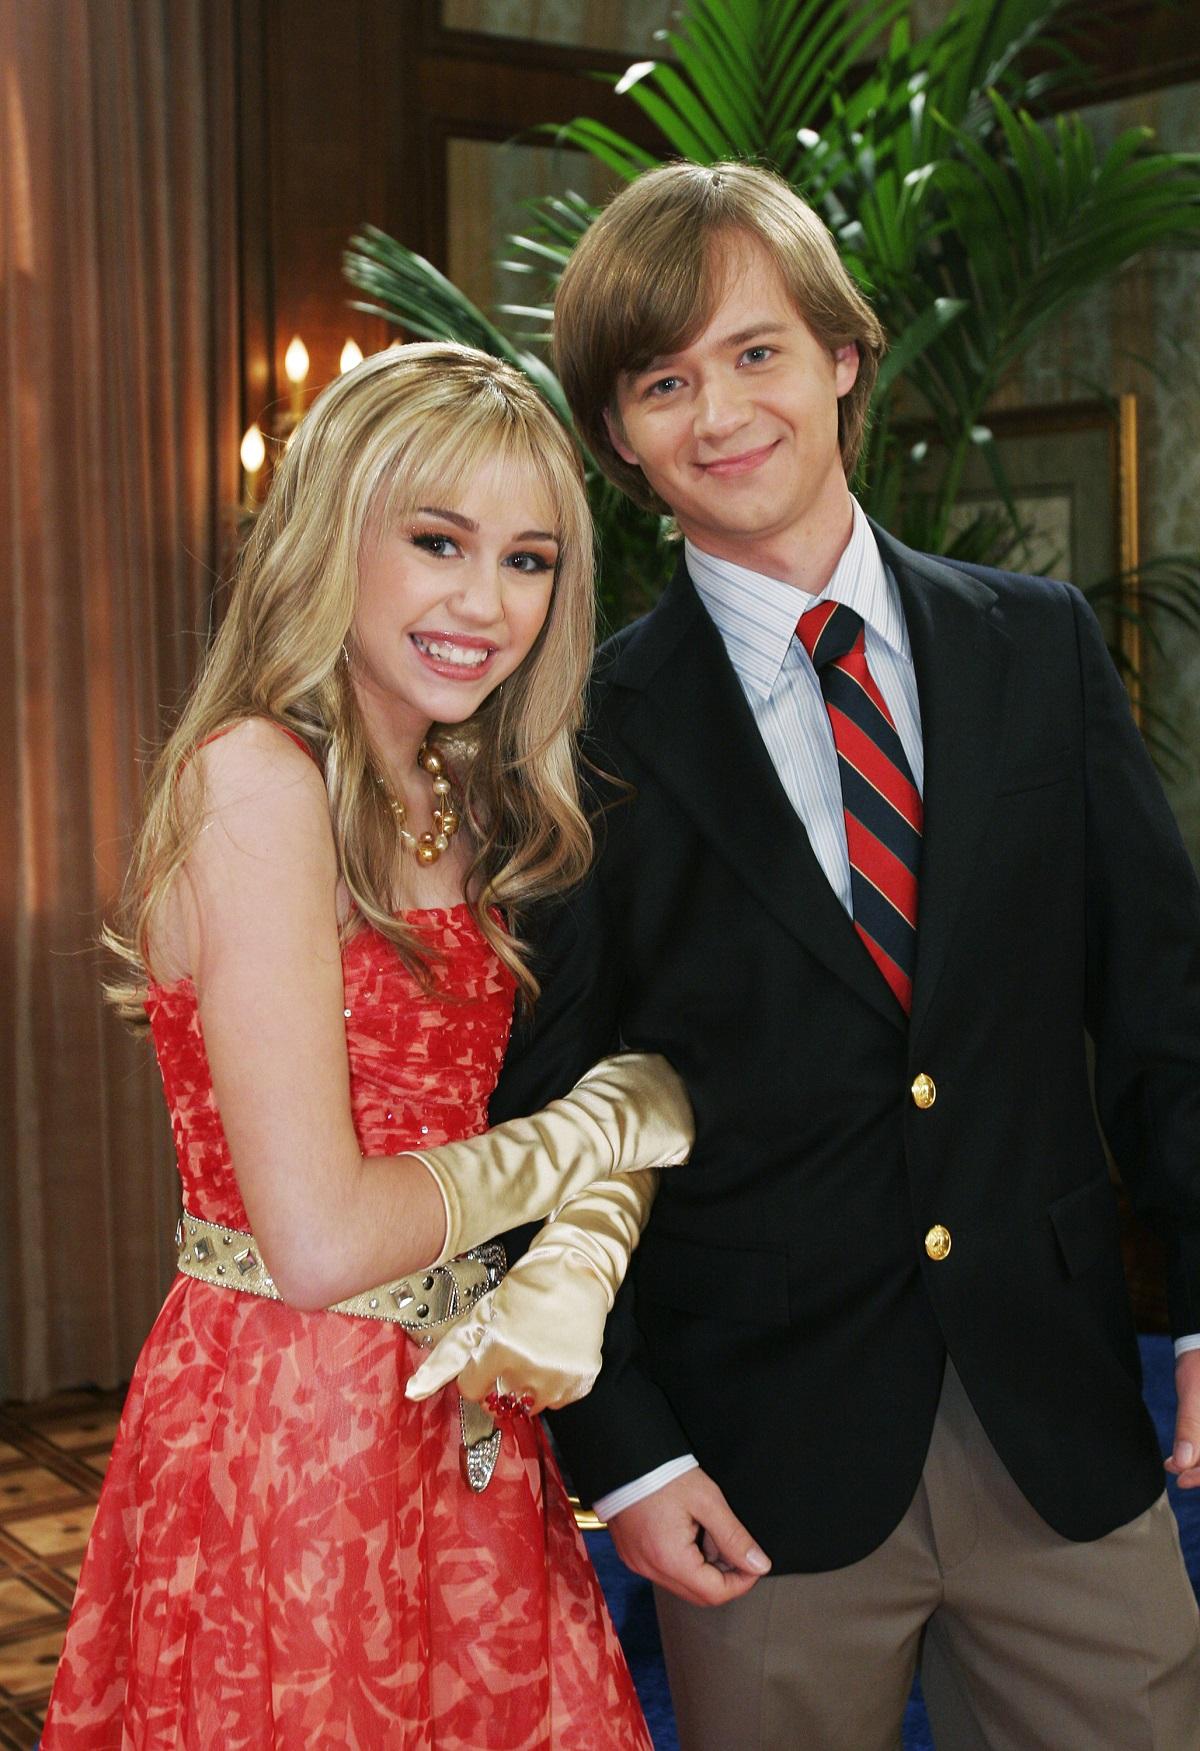 Miley Cyrus and Jason Earle